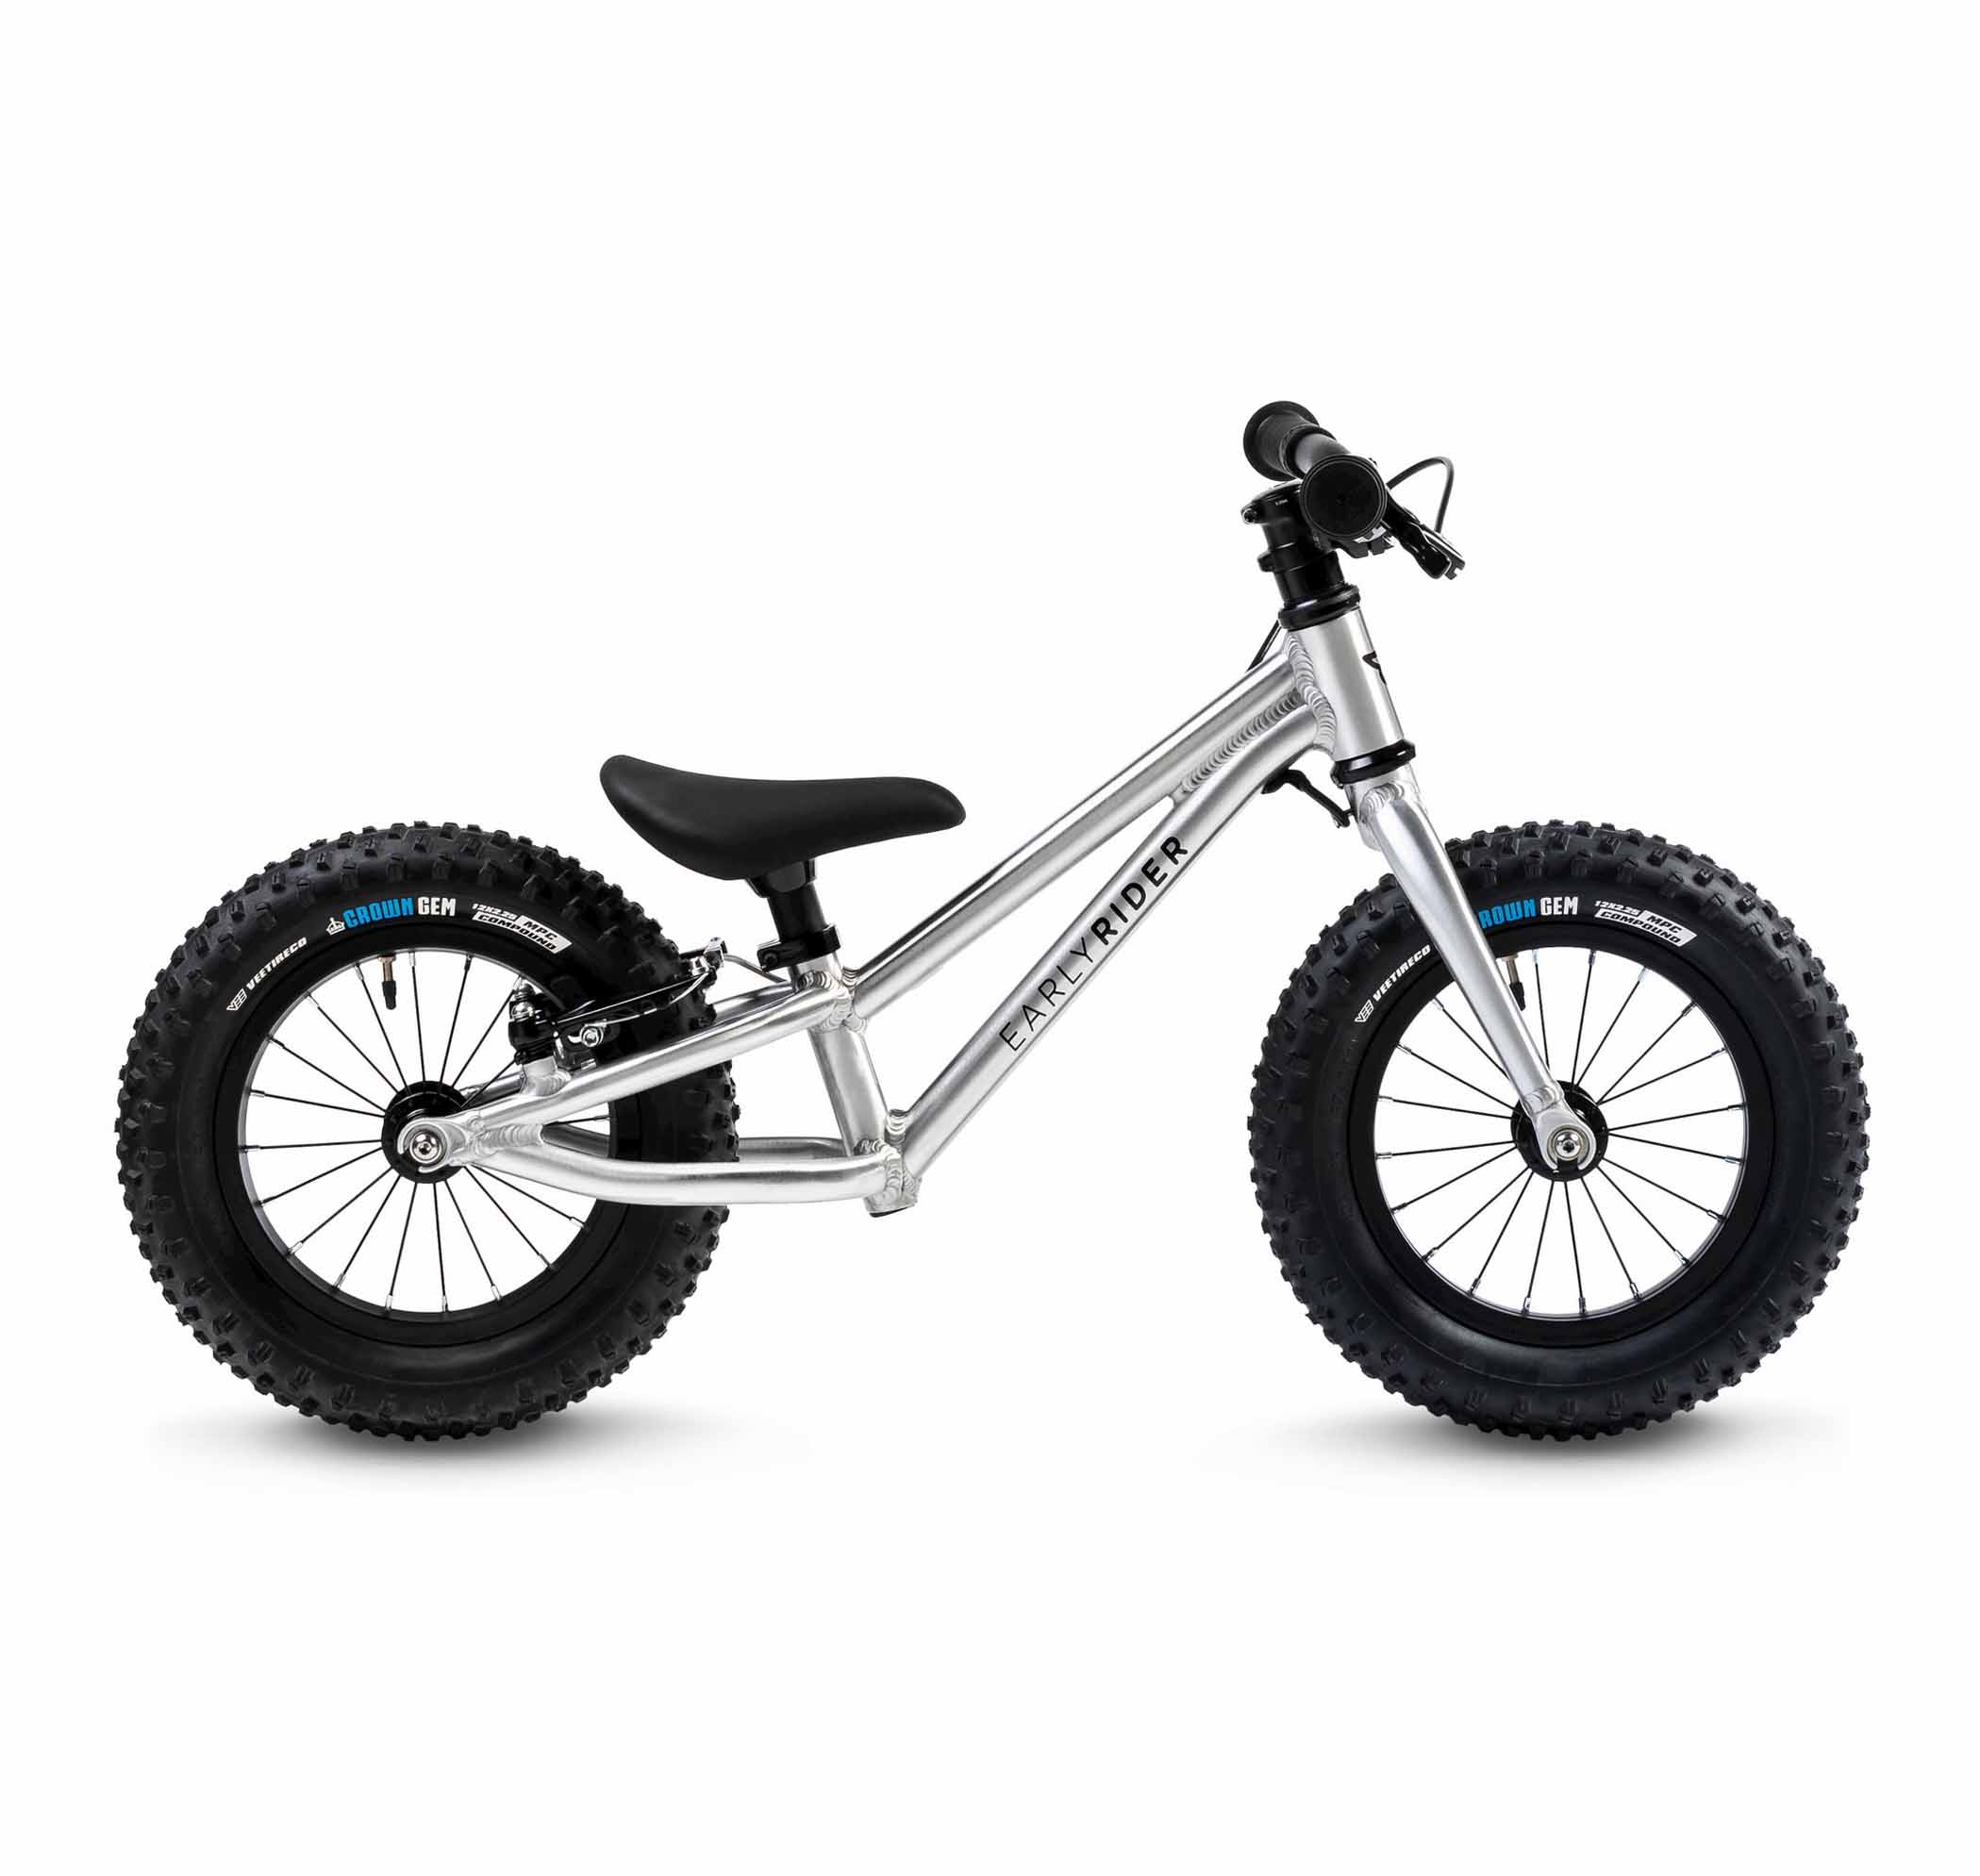 Early_Rider_Rodeo_Bike_Bigfoot_12